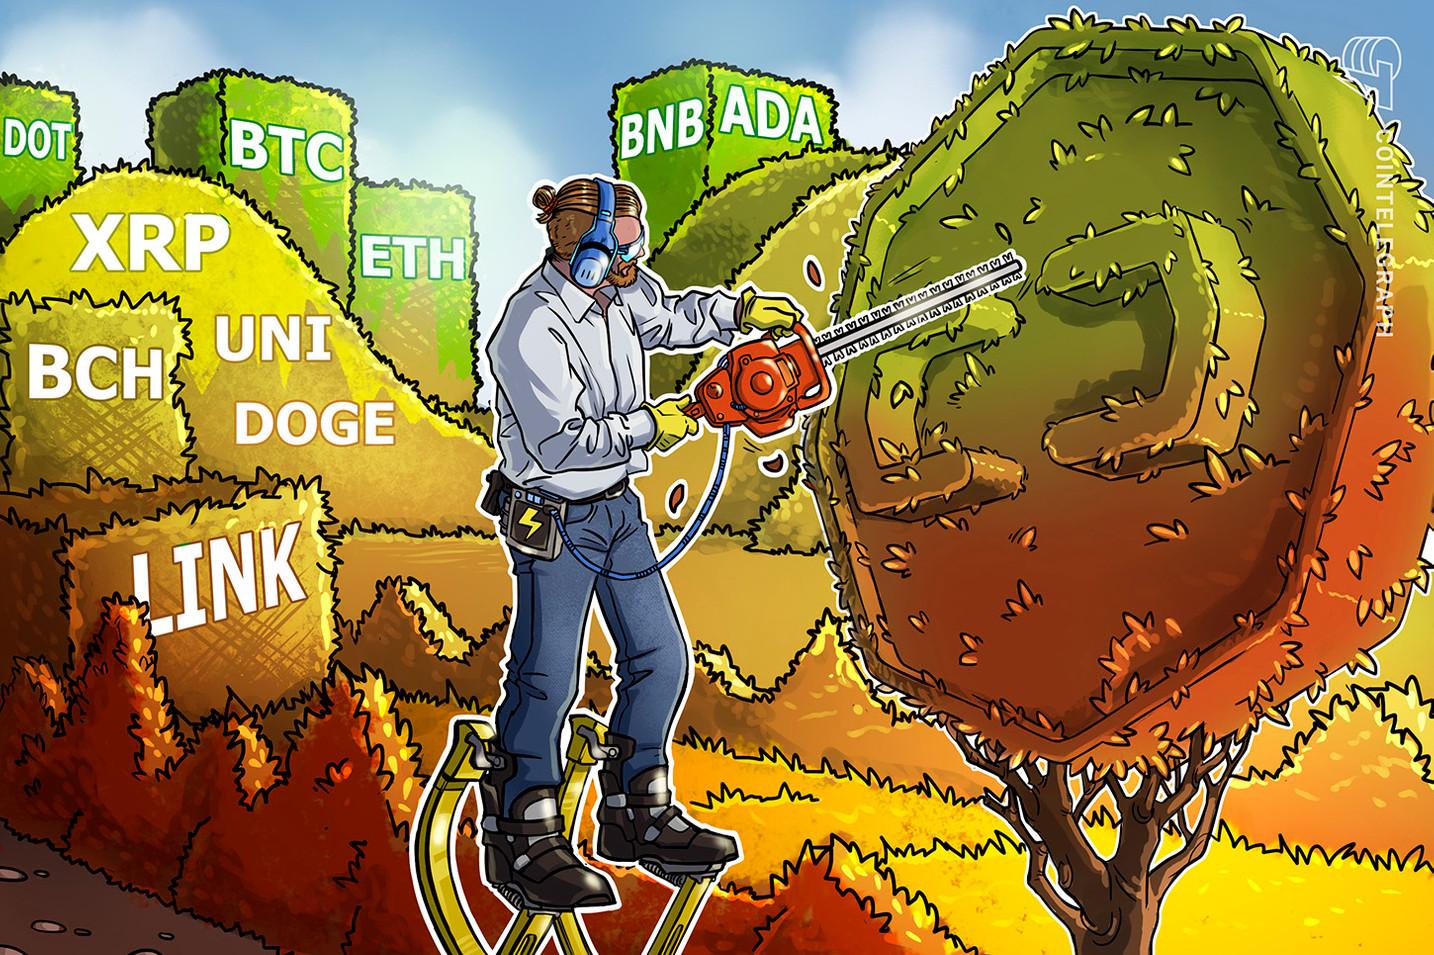 Análisis de precios al 6/8: BTC, ETH, BNB, ADA, XRP, DOGE, DOT, UNI, BCH, LINK